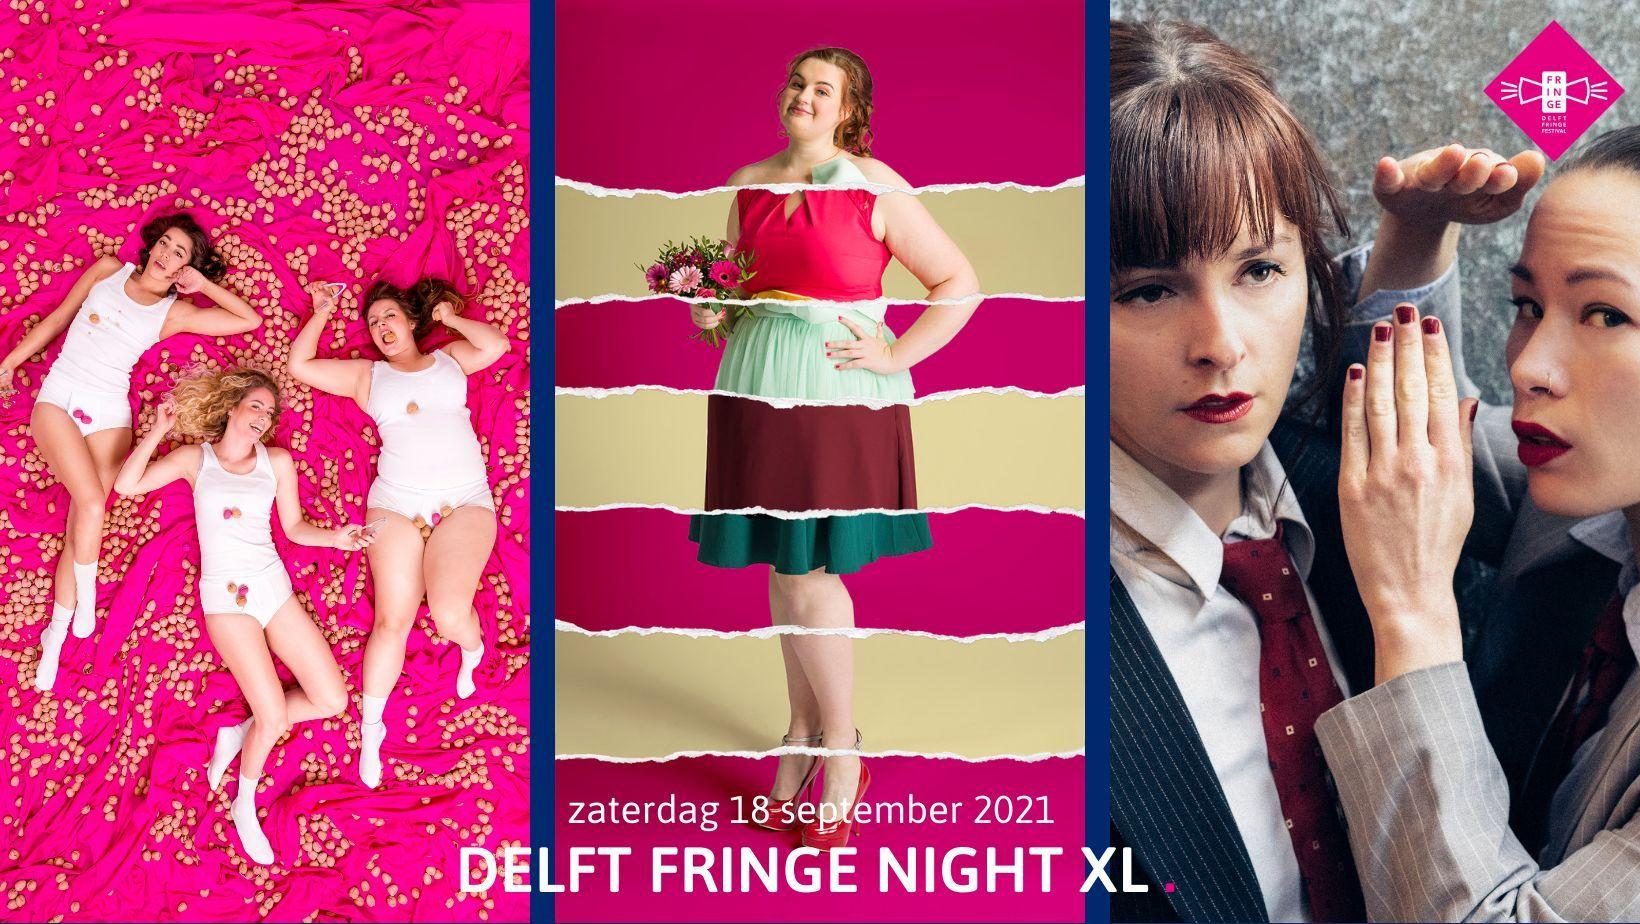 Delft Fringe Night XL